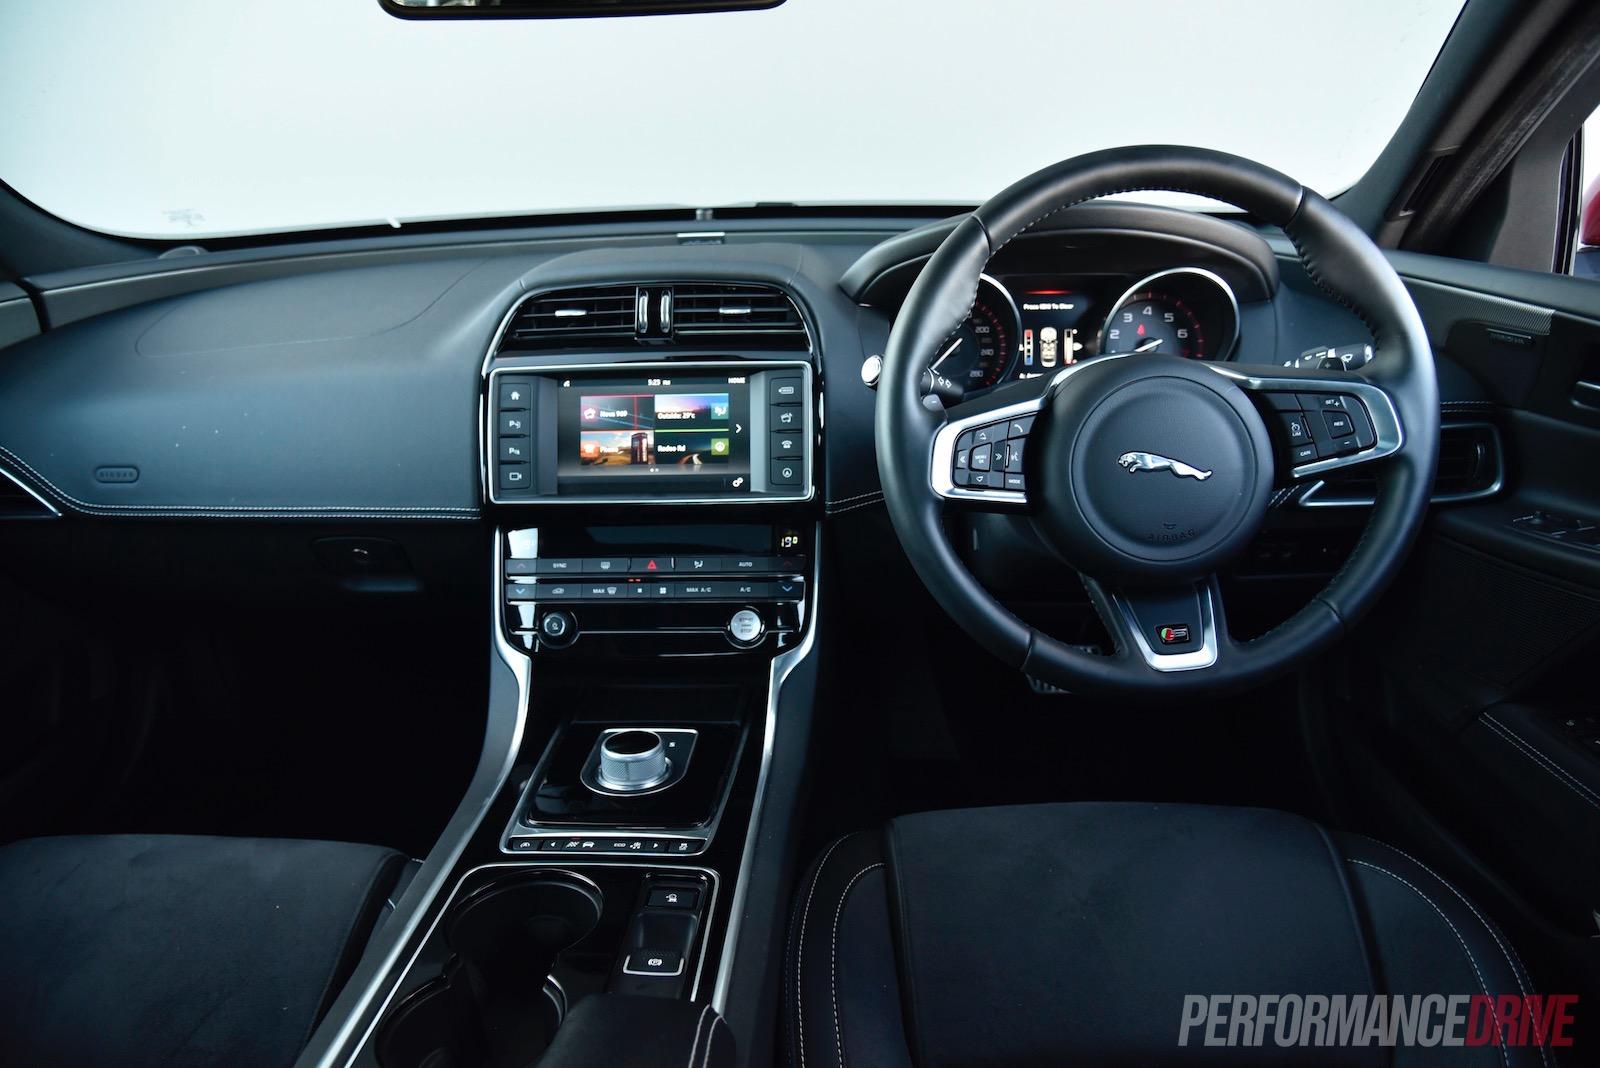 Hand Controls For Car >> 2016 Jaguar XE S review (video) | PerformanceDrive